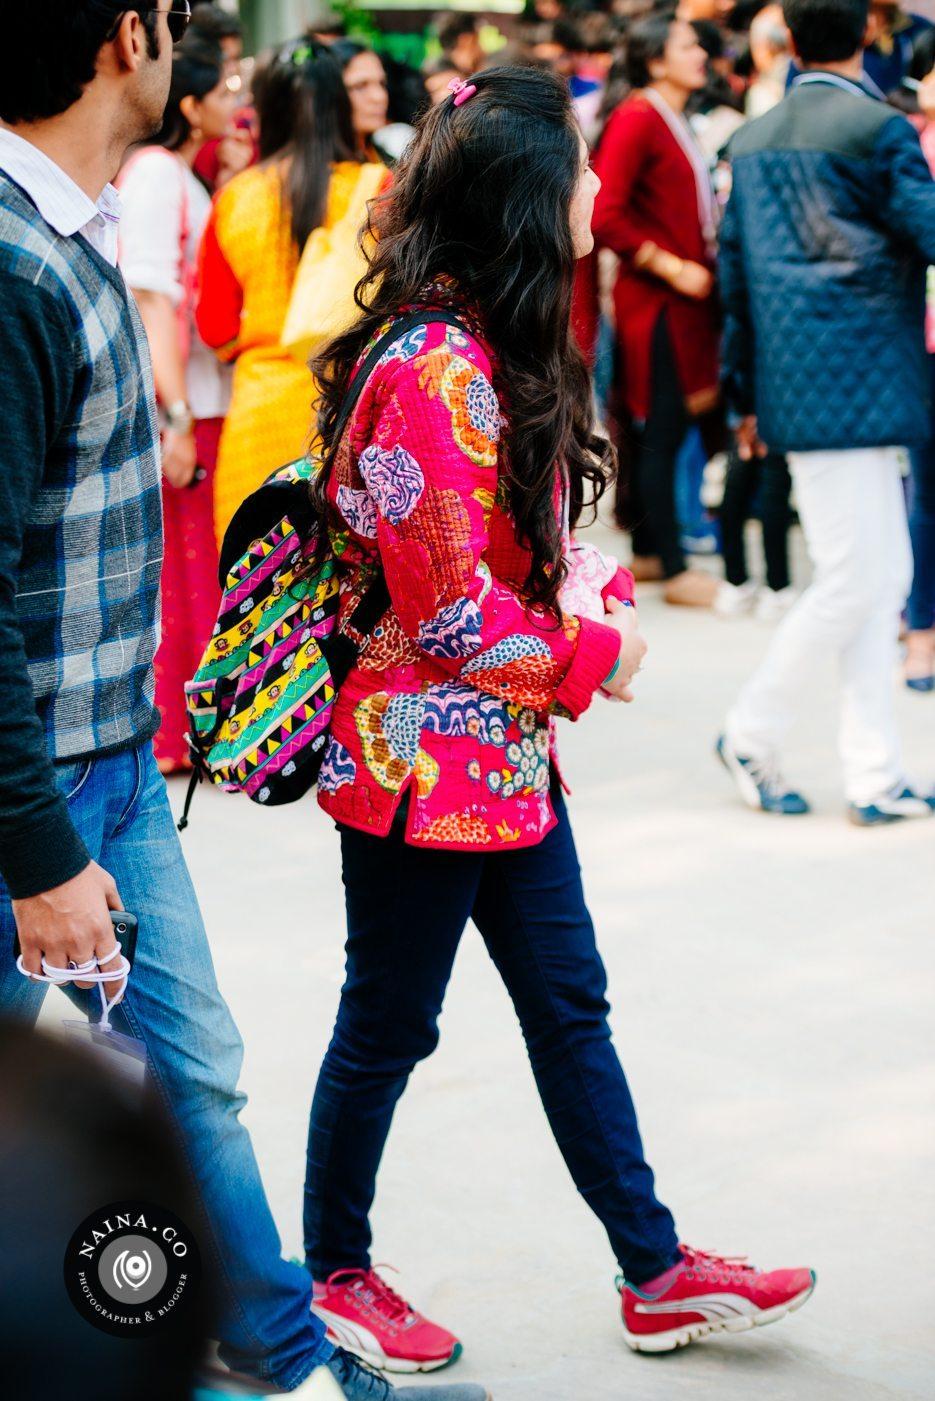 Naina.co-Raconteuse-Visuelle-Photographer-Blogger-Storyteller-Luxury-Lifestyle-January-2015-Jaipur-Literature-Festival-StRegis-LeMeridien-ZeeJLF-EyesForStreetStyle-37